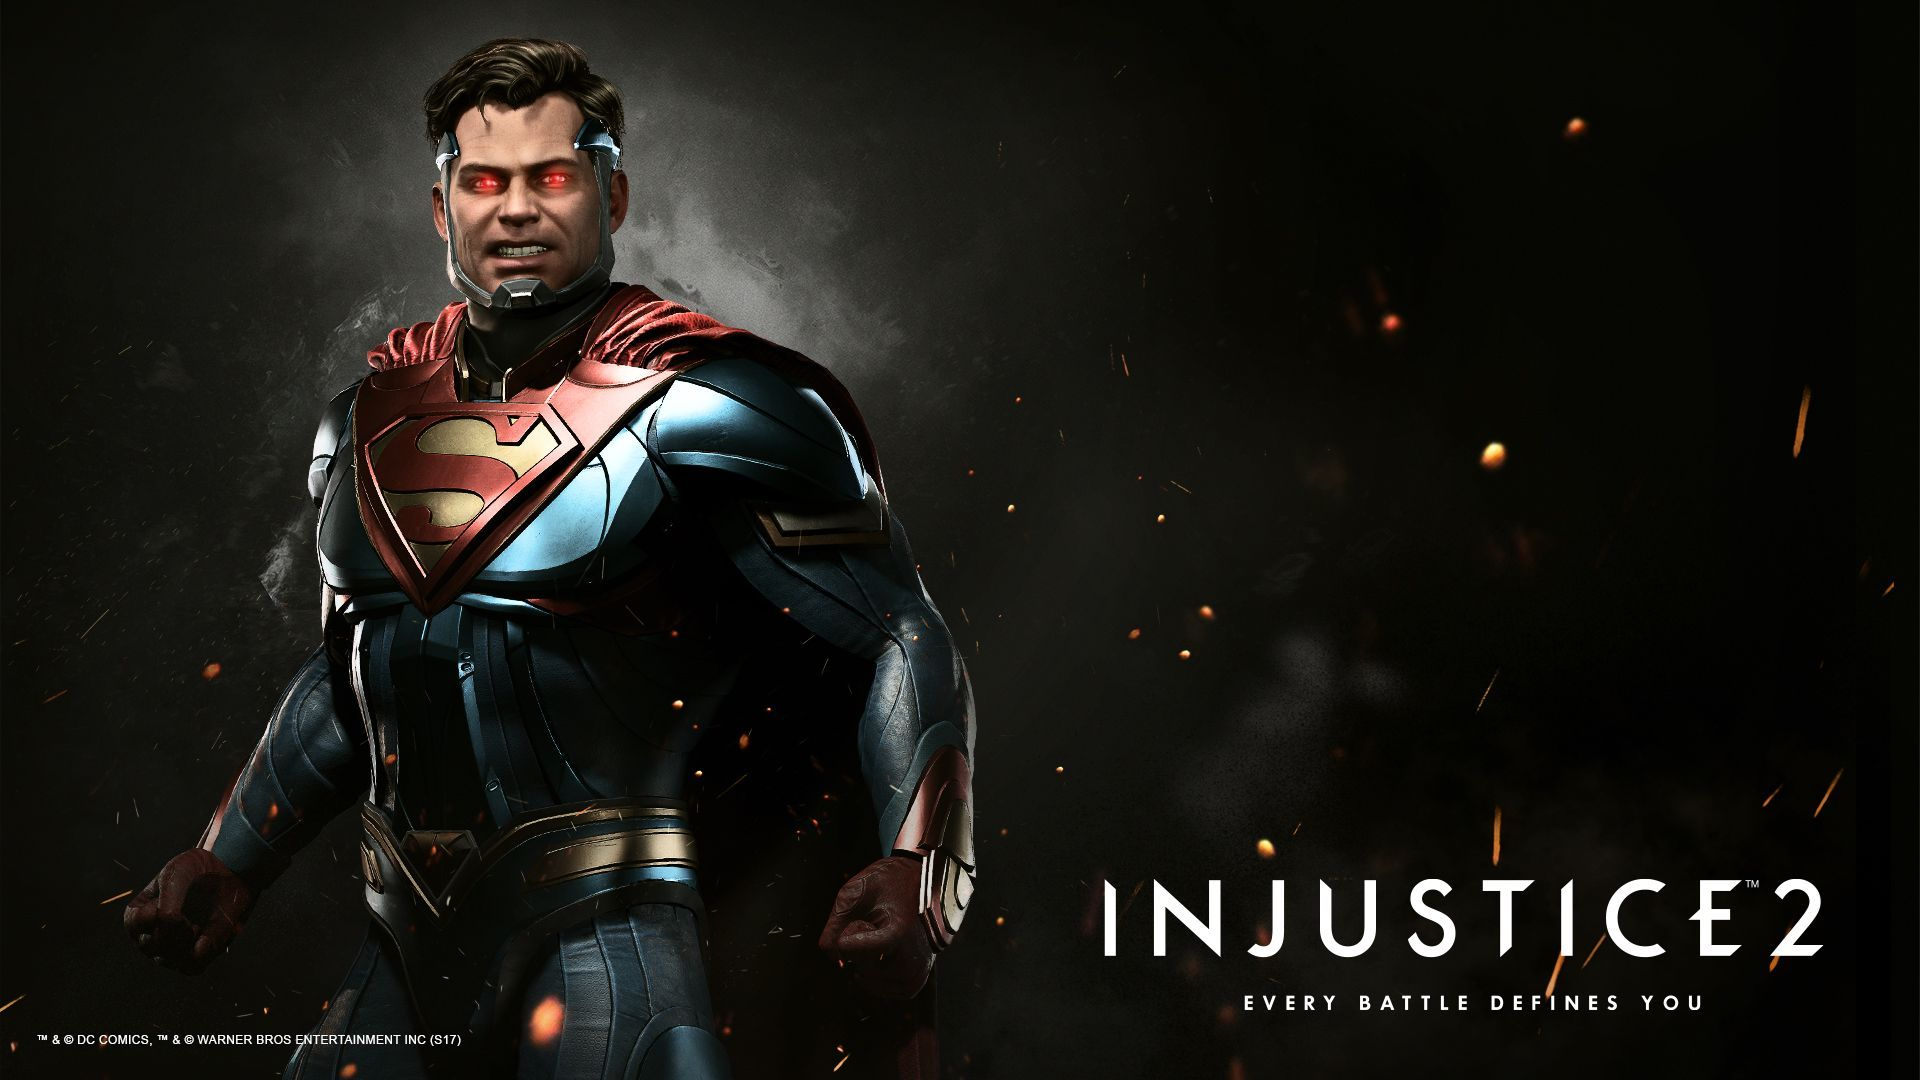 Injustice2 Superman Wallpaper 1920x1080 42 Jpg 1920 1080 Injustice 2 Injustice 2 Characters Injustice 2 Game